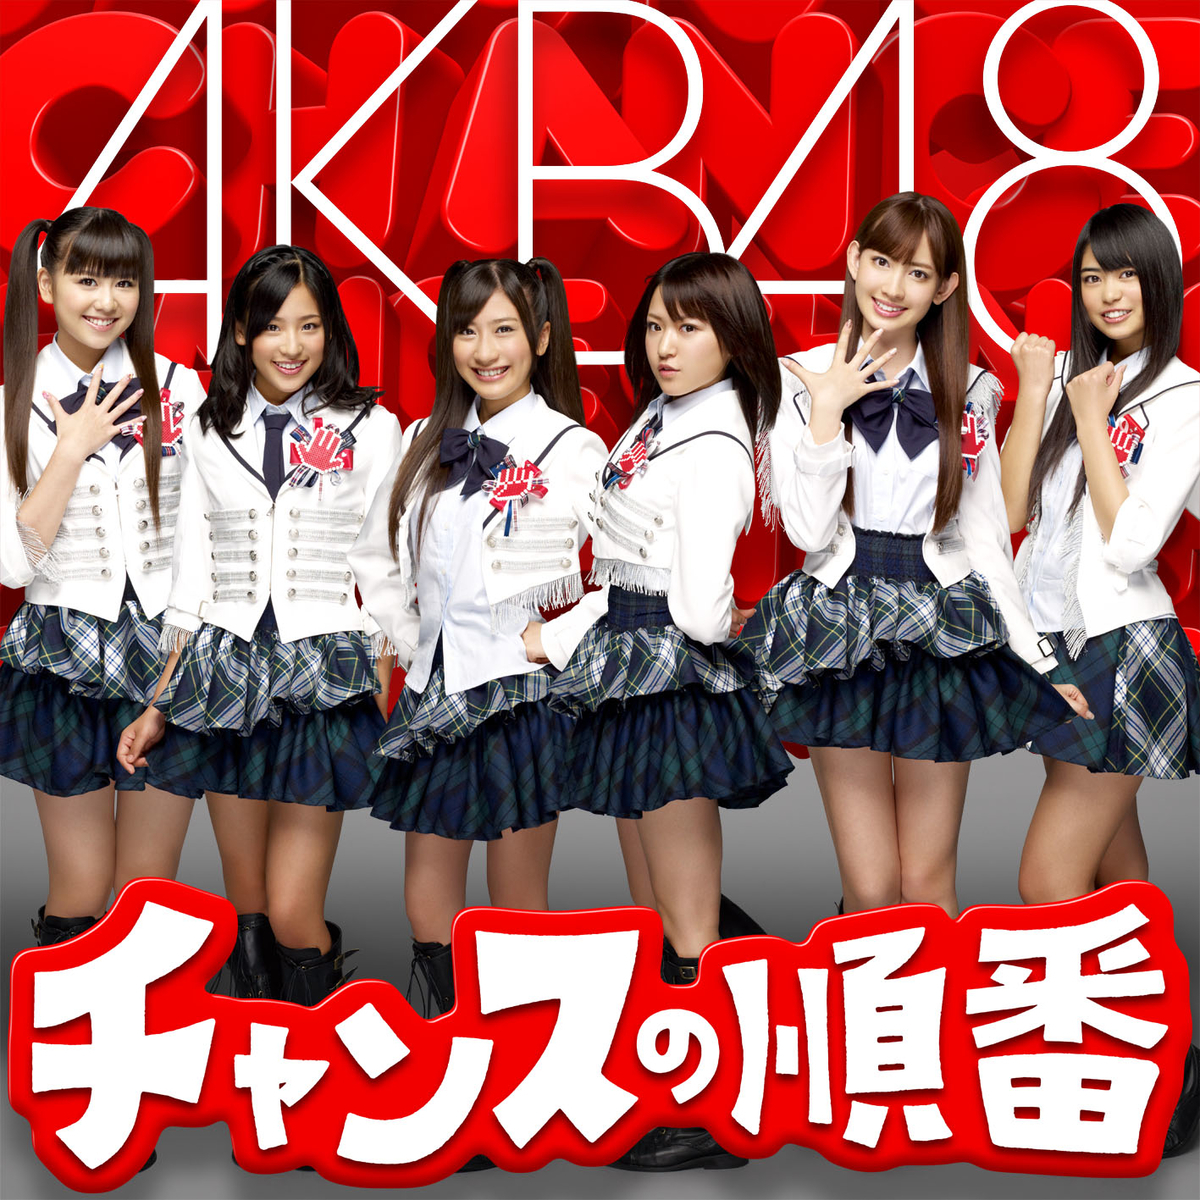 AKB48『チャンスの順番(通常盤Type-A)』※右から3人目がセンターの内田眞由美 キングレコード、2010年